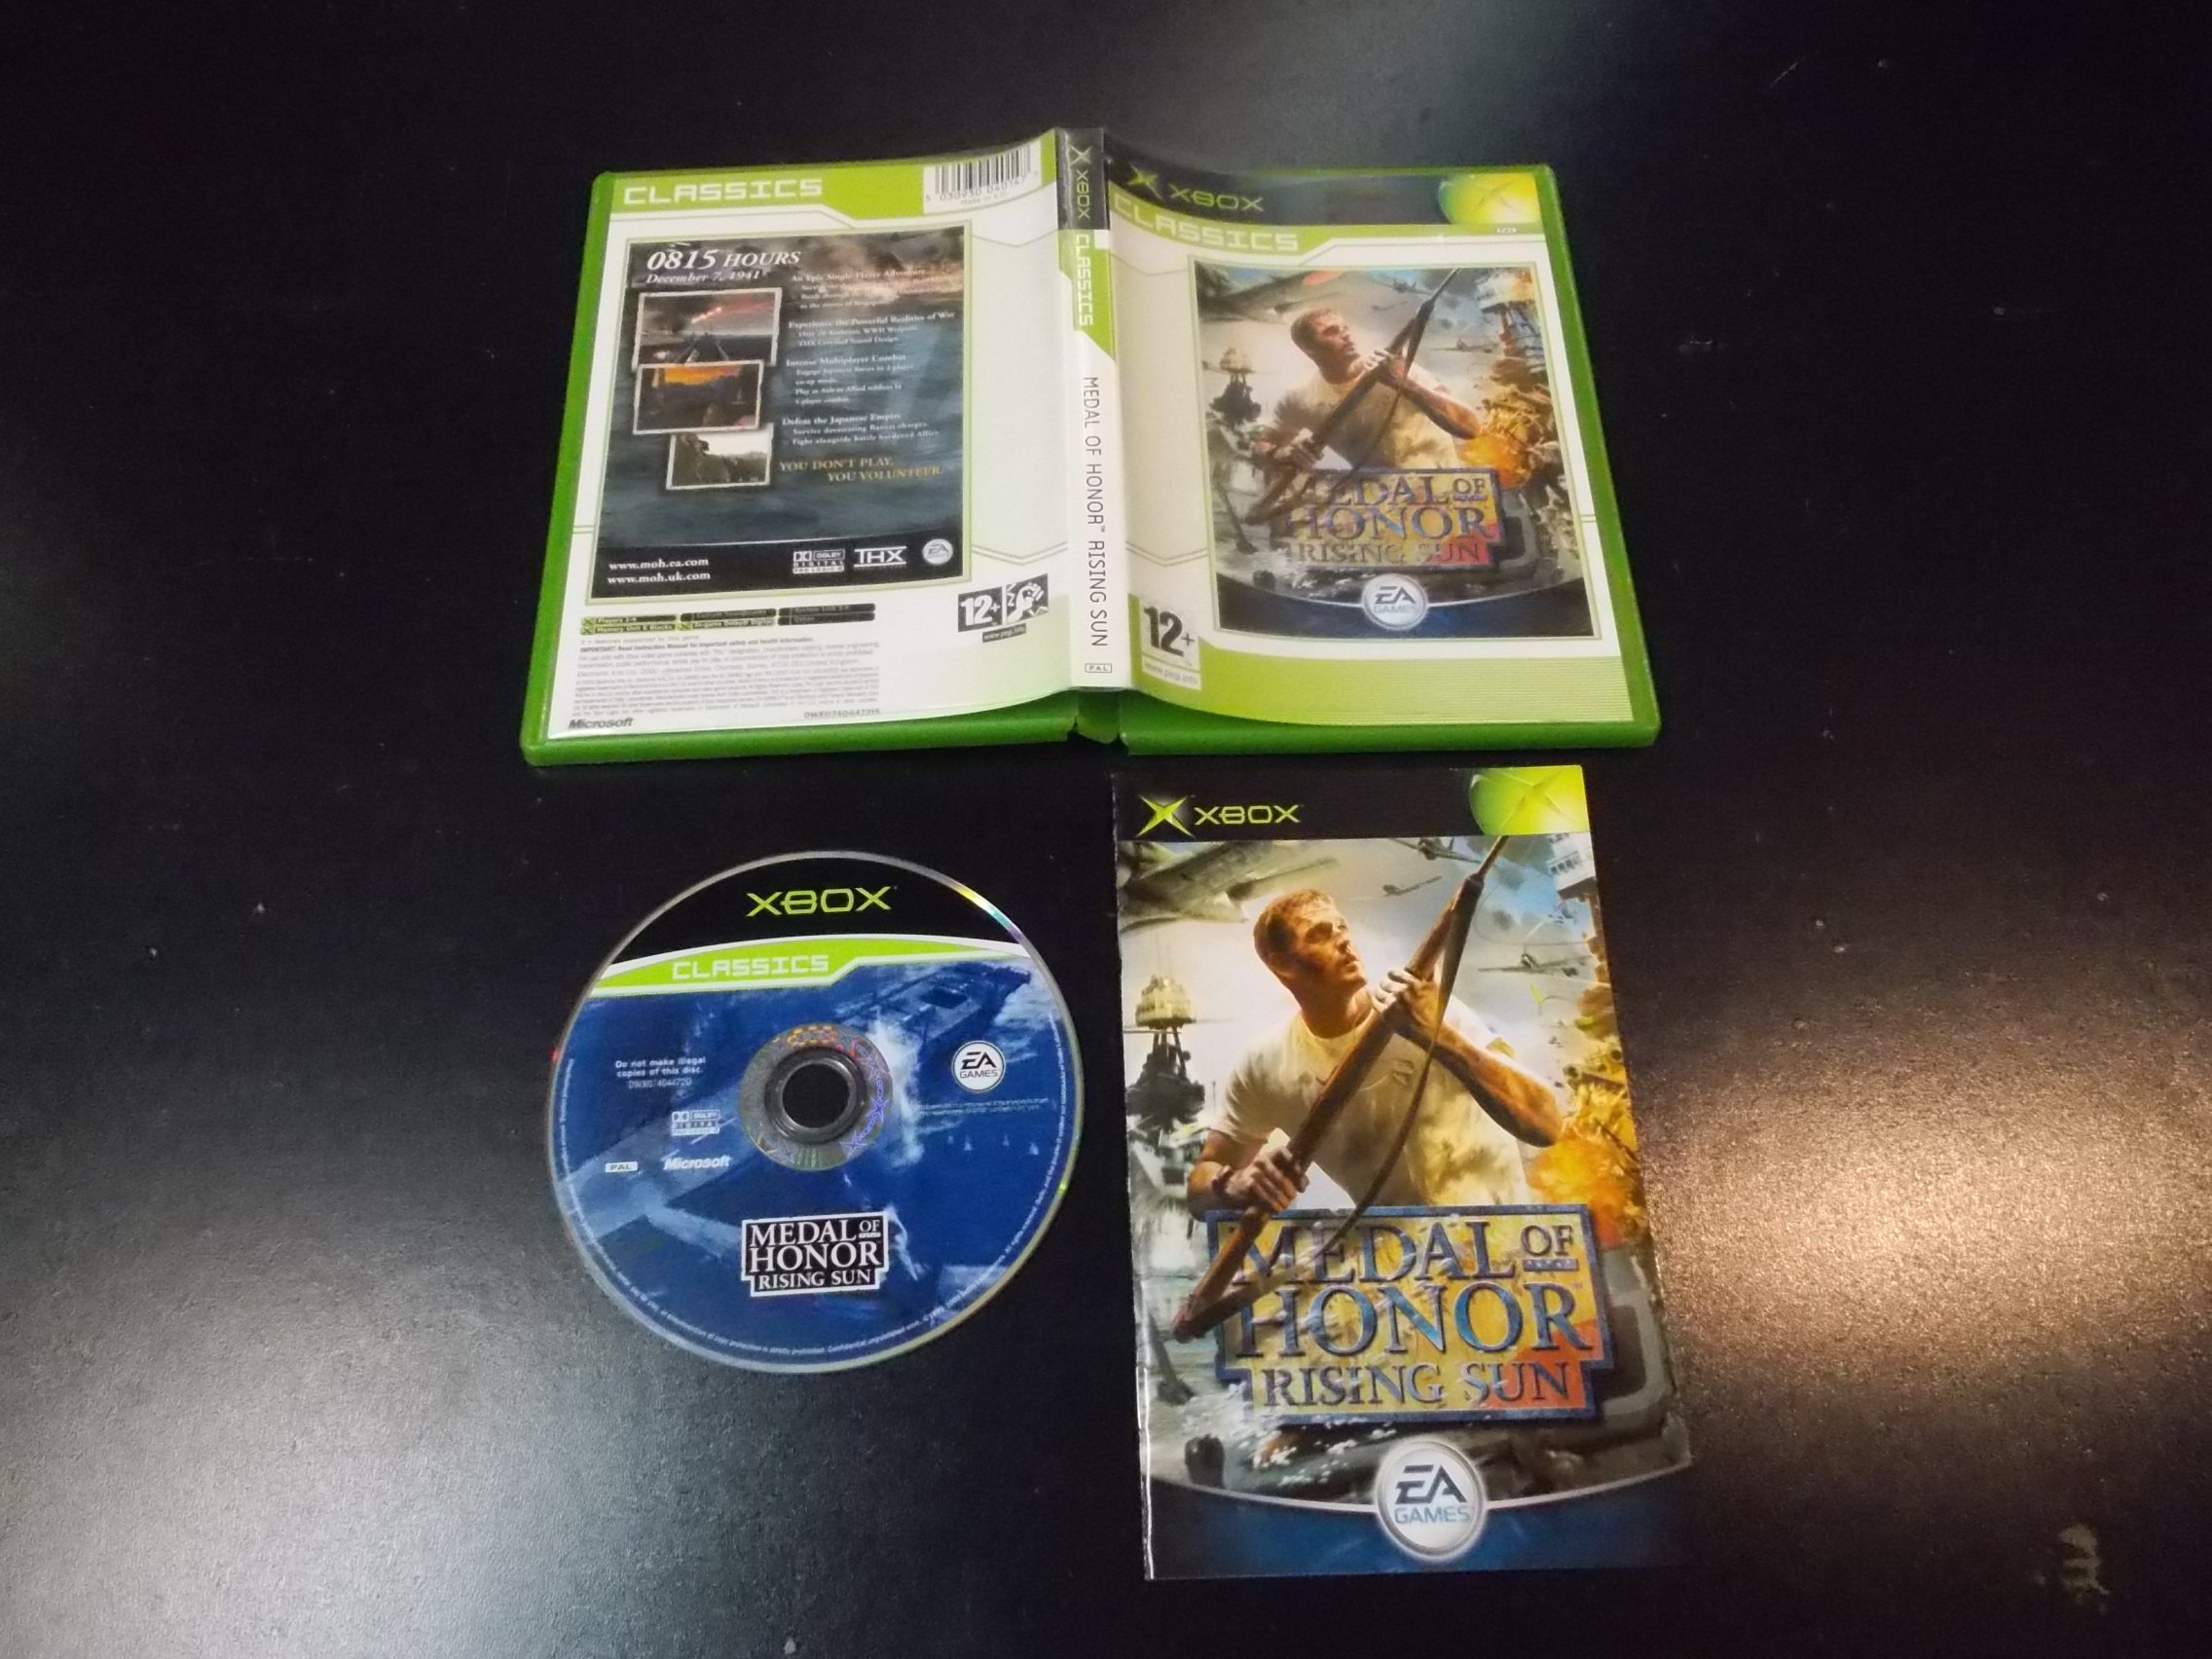 Medal of Honor: Rising Sun - GRA Xbox Classic